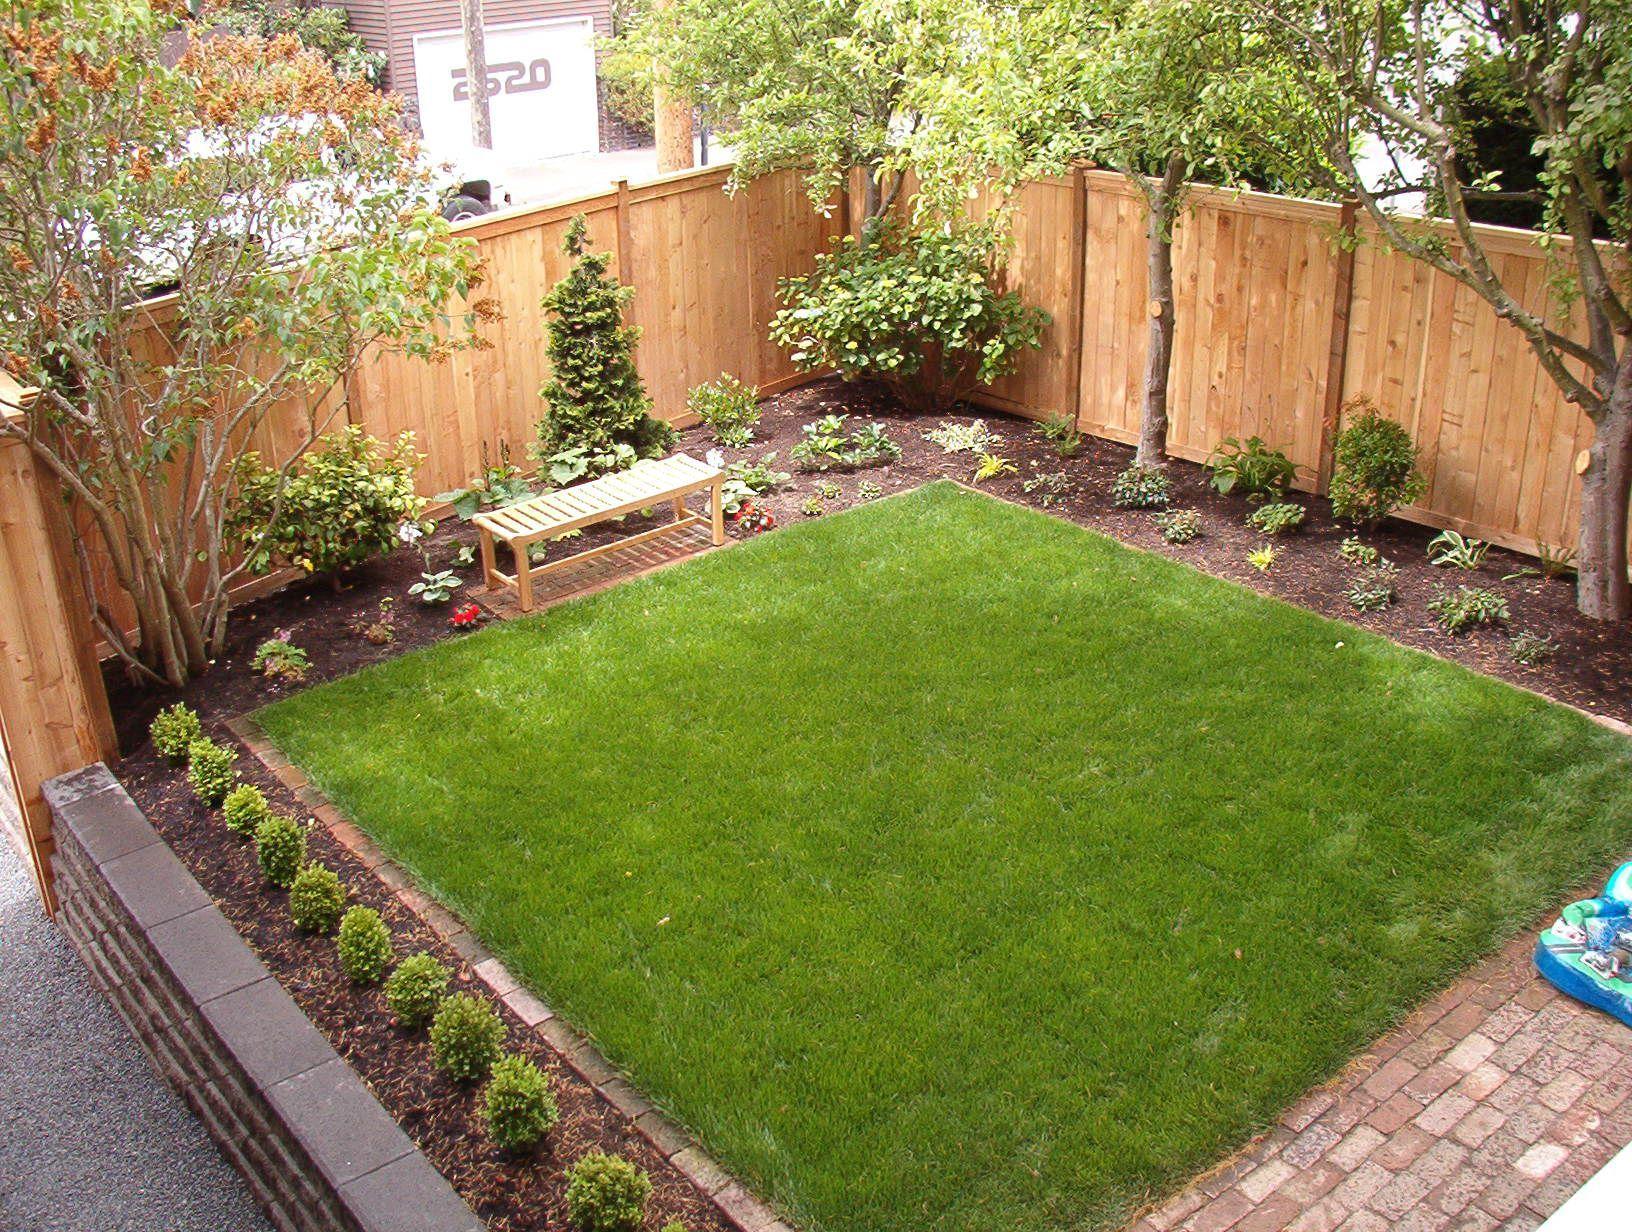 Inspirational Backyard Design Ideas For Small Yards Landscapingfordummies Backyard Landscaping Designs Landscaping Along Fence Front Yard Landscaping Design Backyard landscaping ideas along fence